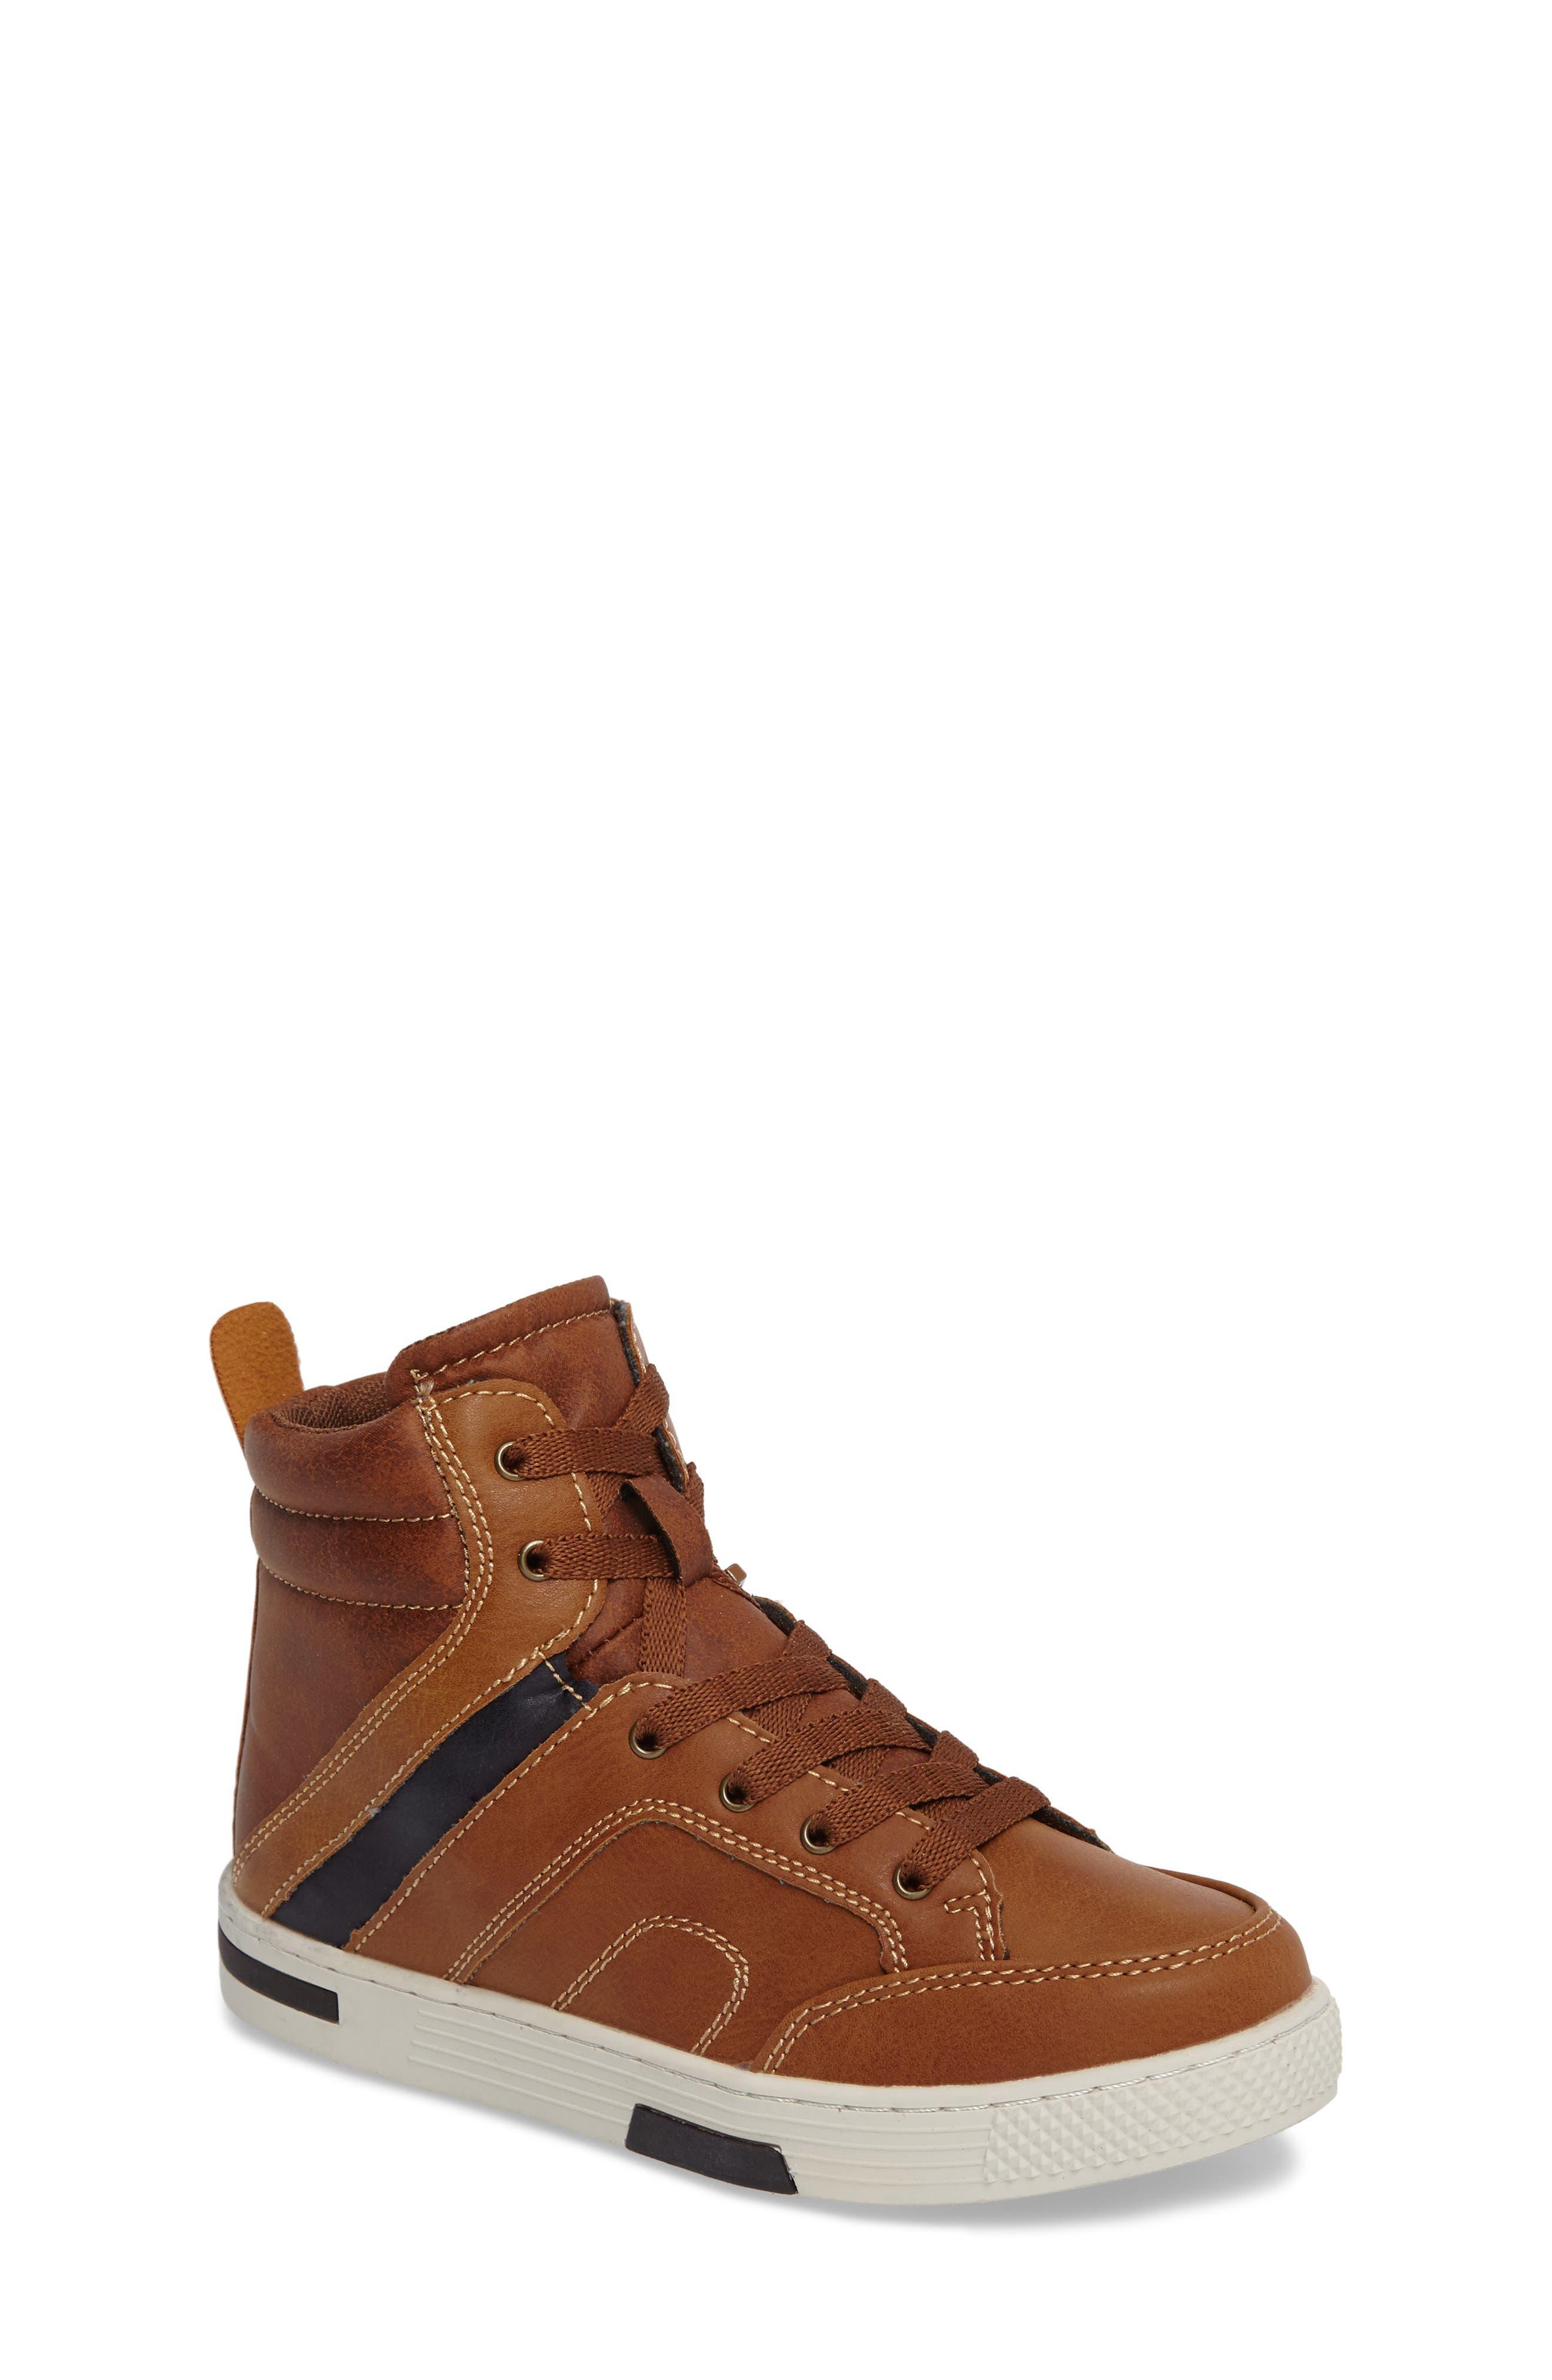 Steve Madden Cooler High Top Sneaker (Toddler, Little Kid & Big Kid)